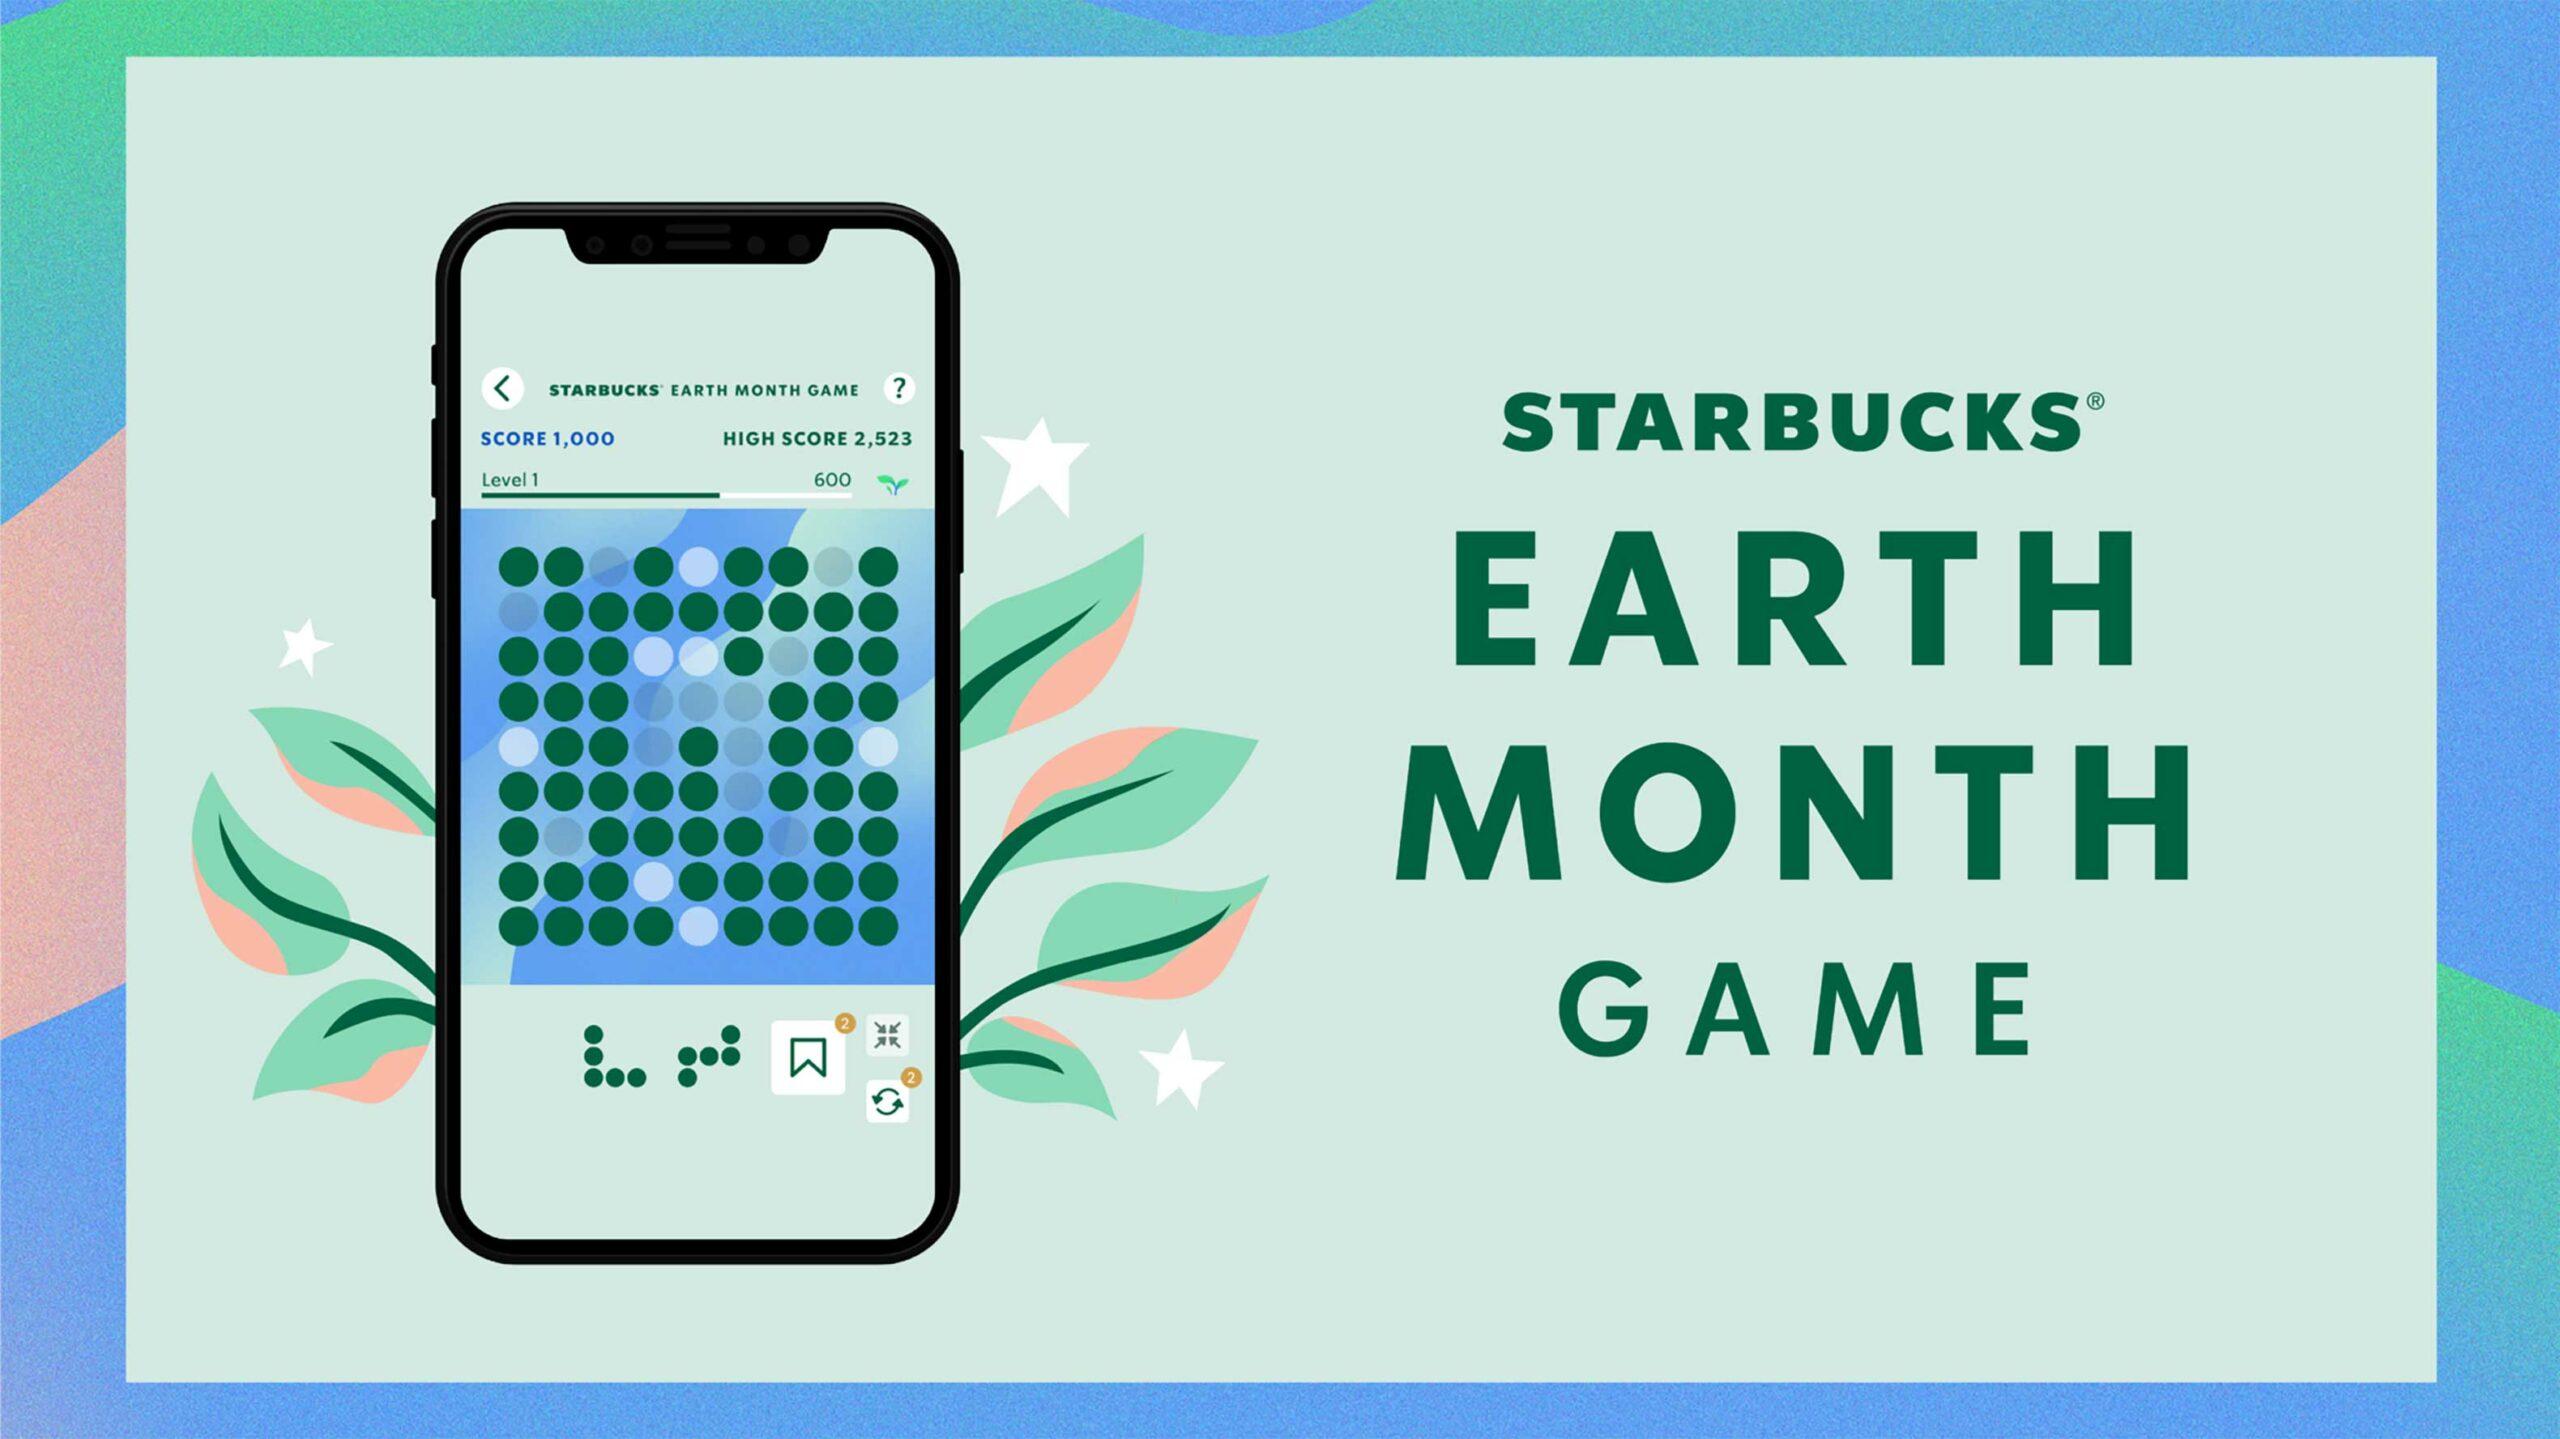 Starbucks mobile game